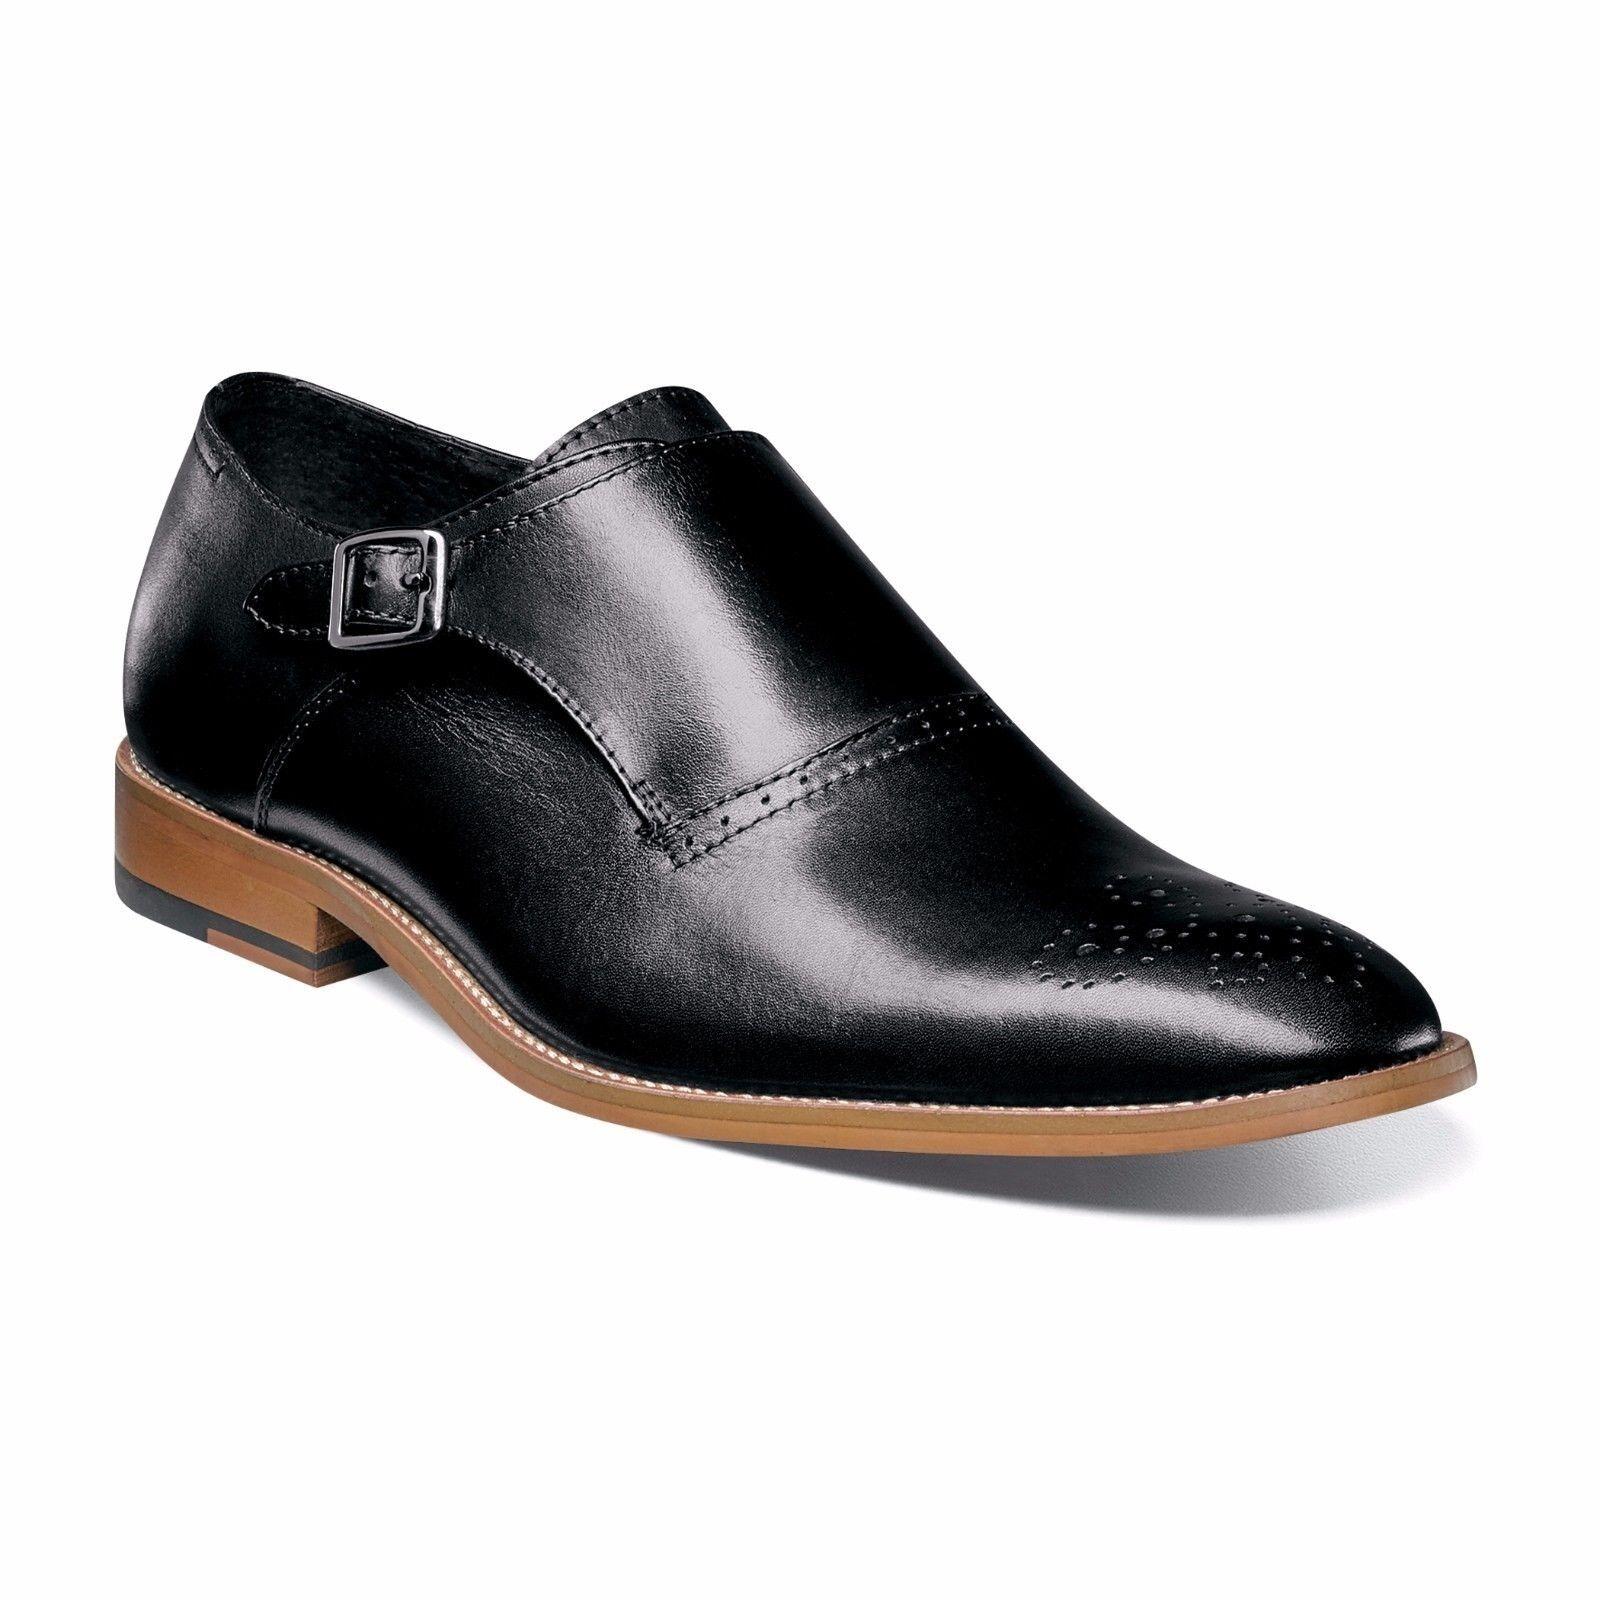 e90dbf97627 Stacy Adams Para Hombre Negro Cuero Plain Toe Dinsmore Monje Correa Vestido  Zapato de tendencias